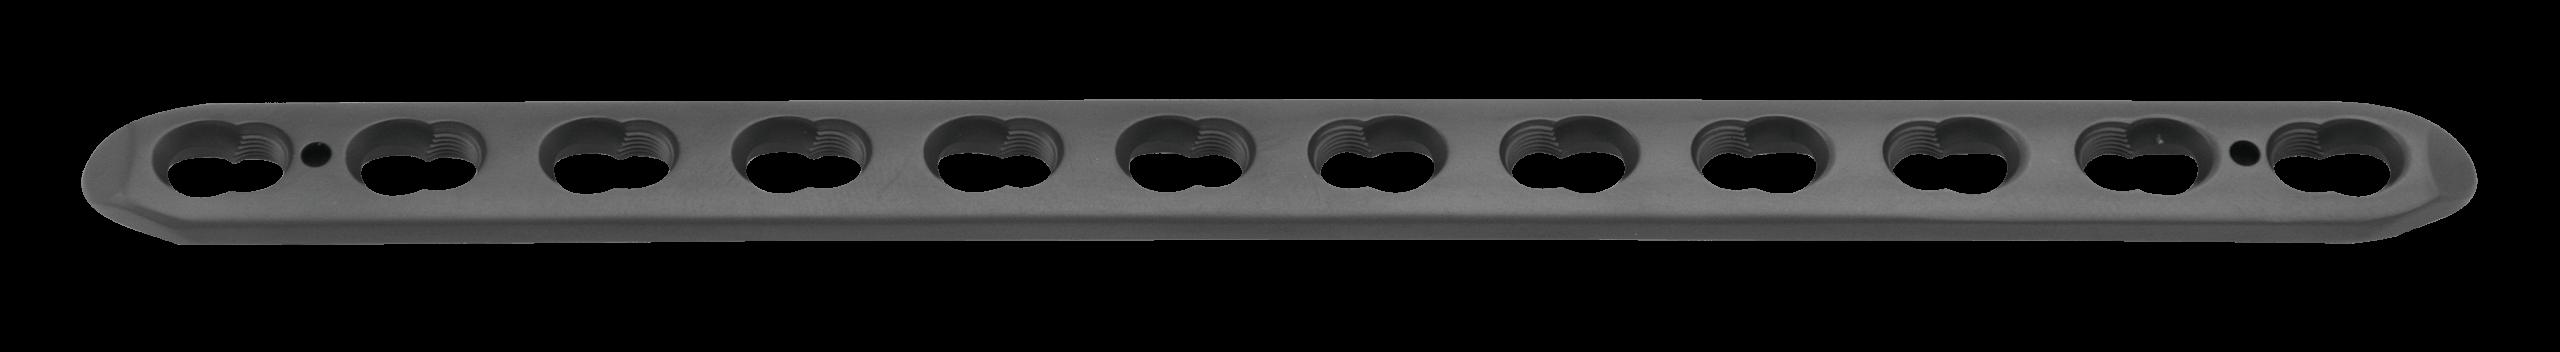 Small-locking-plate_11-51212